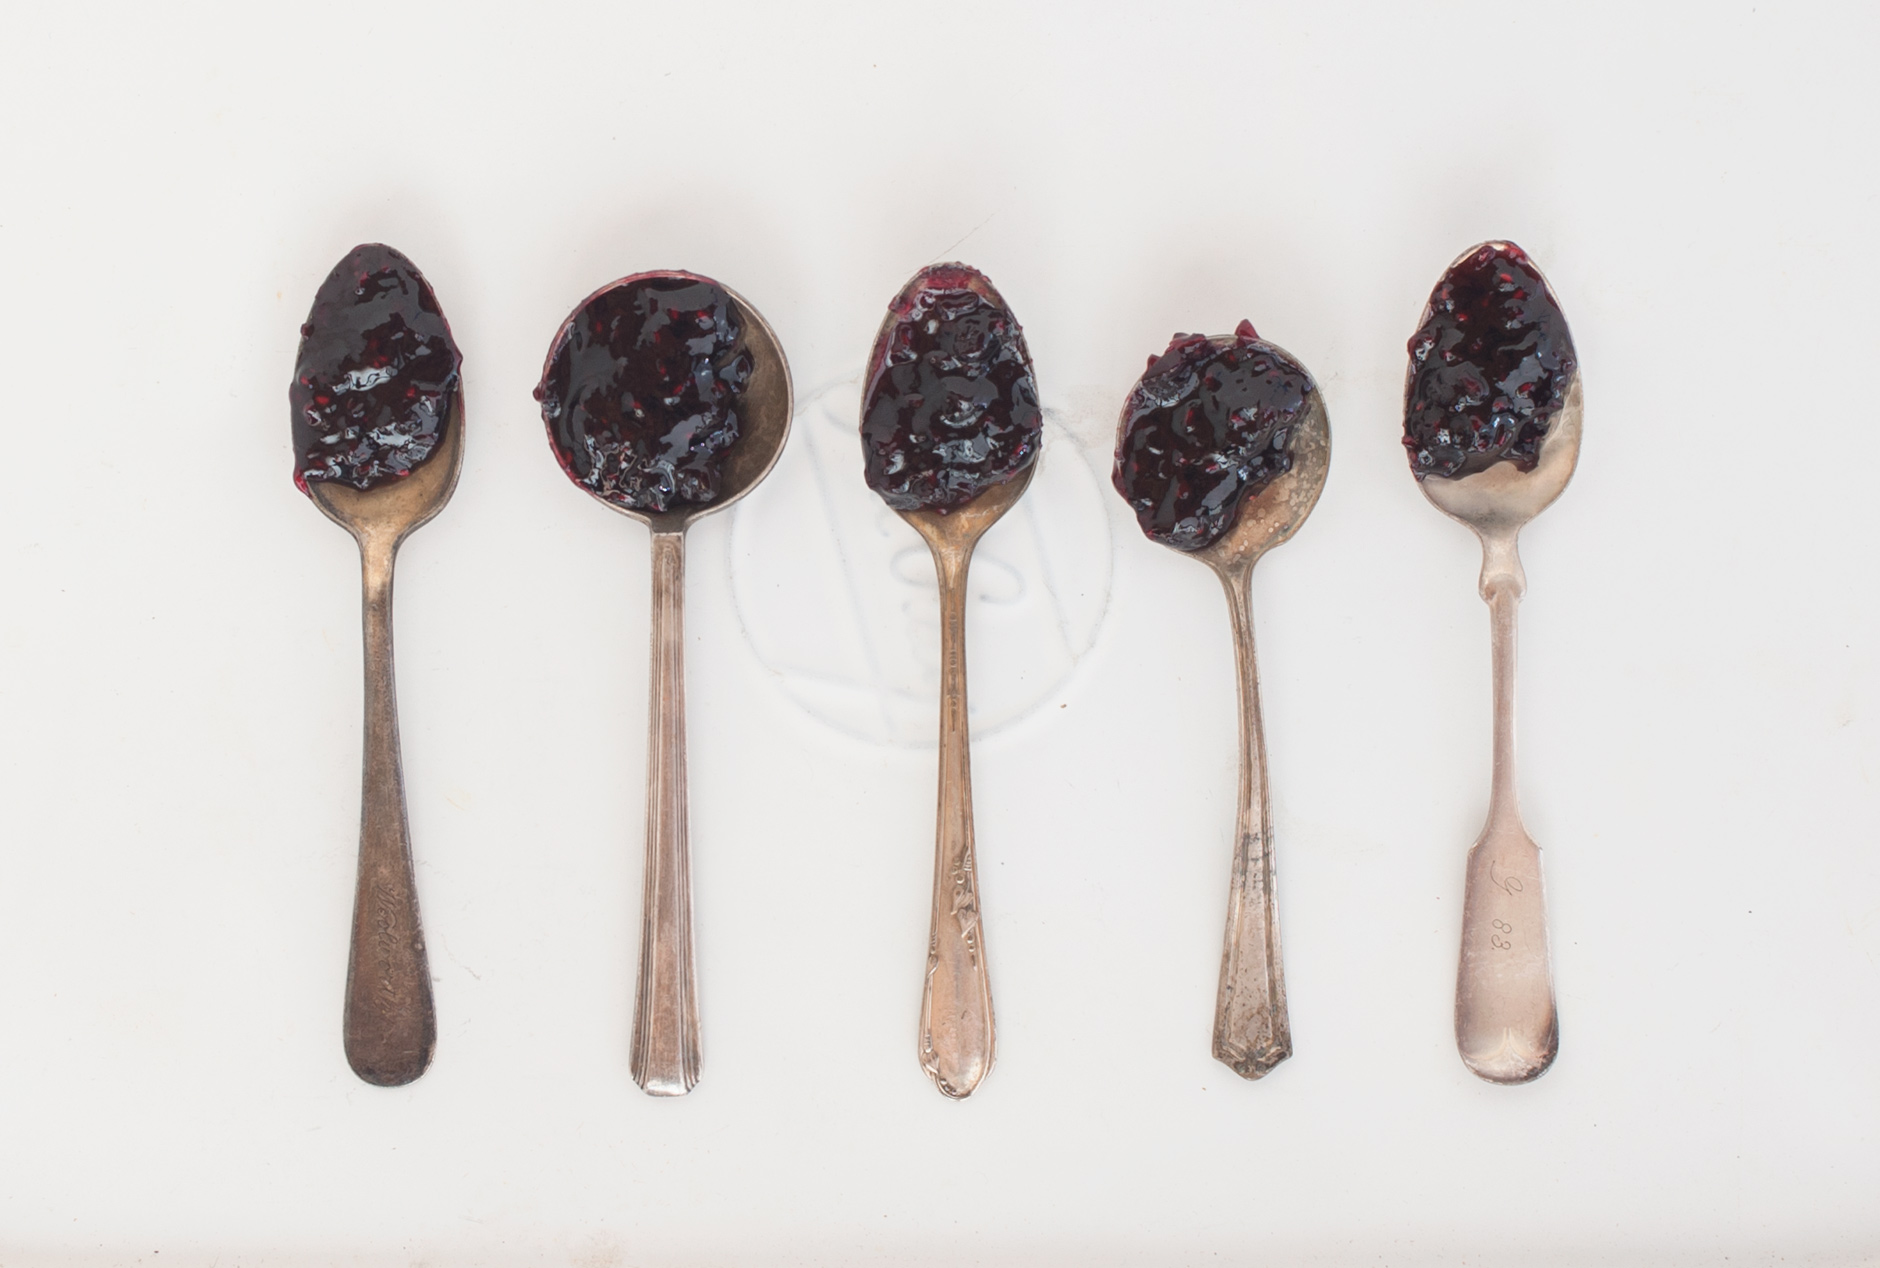 heart_pies_food_photography_4.jpg